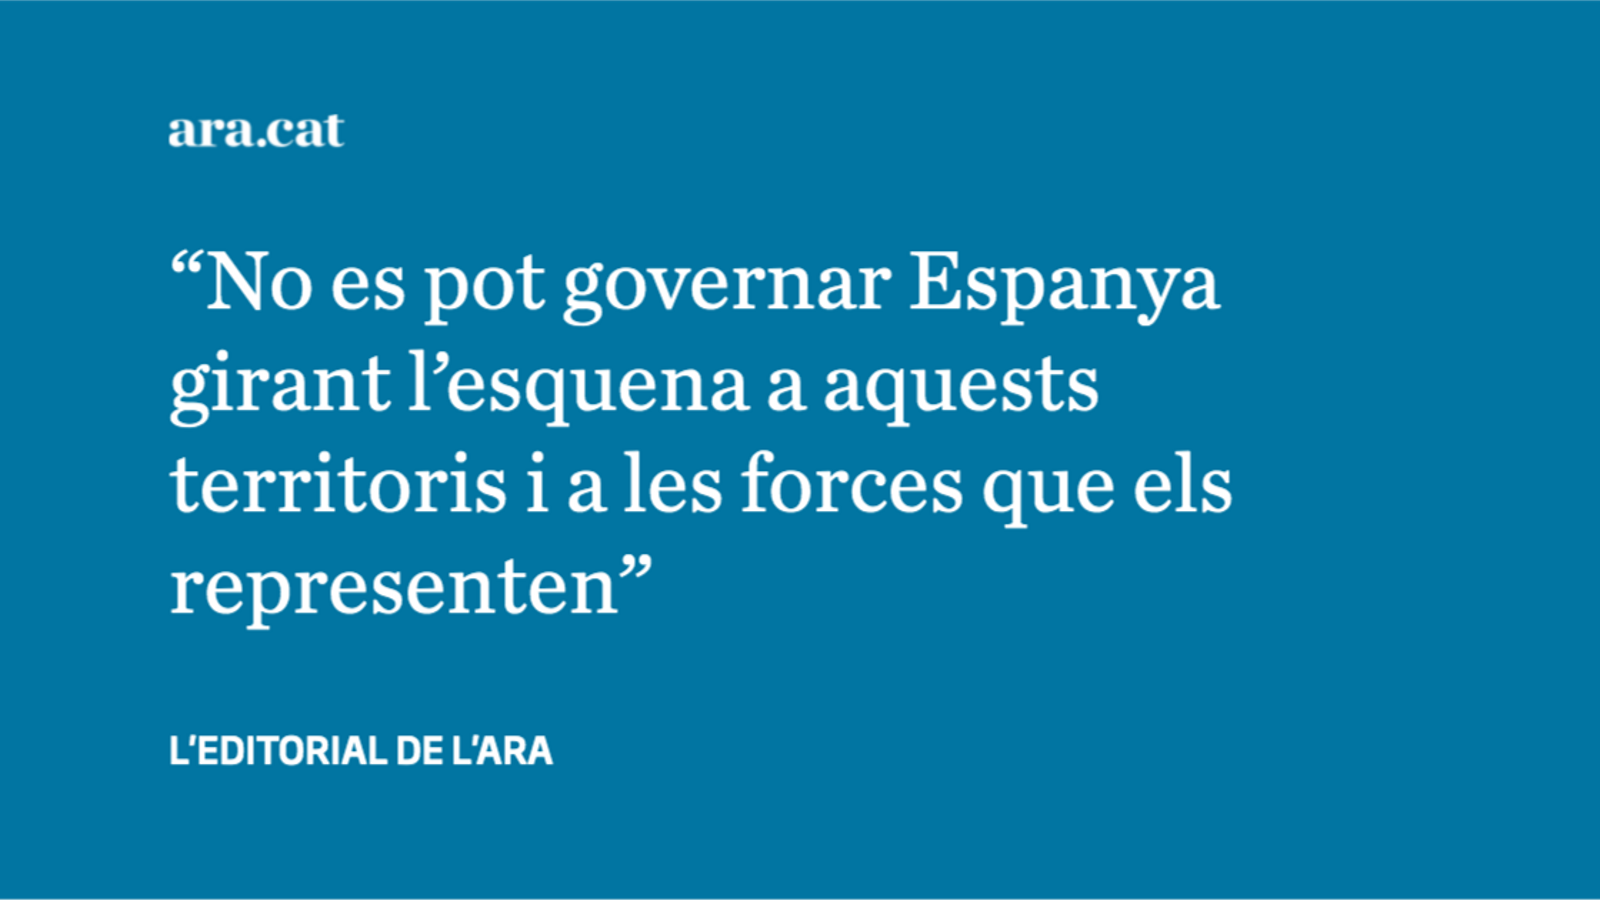 Euskadi i Galícia inauguren les eleccions postcovid